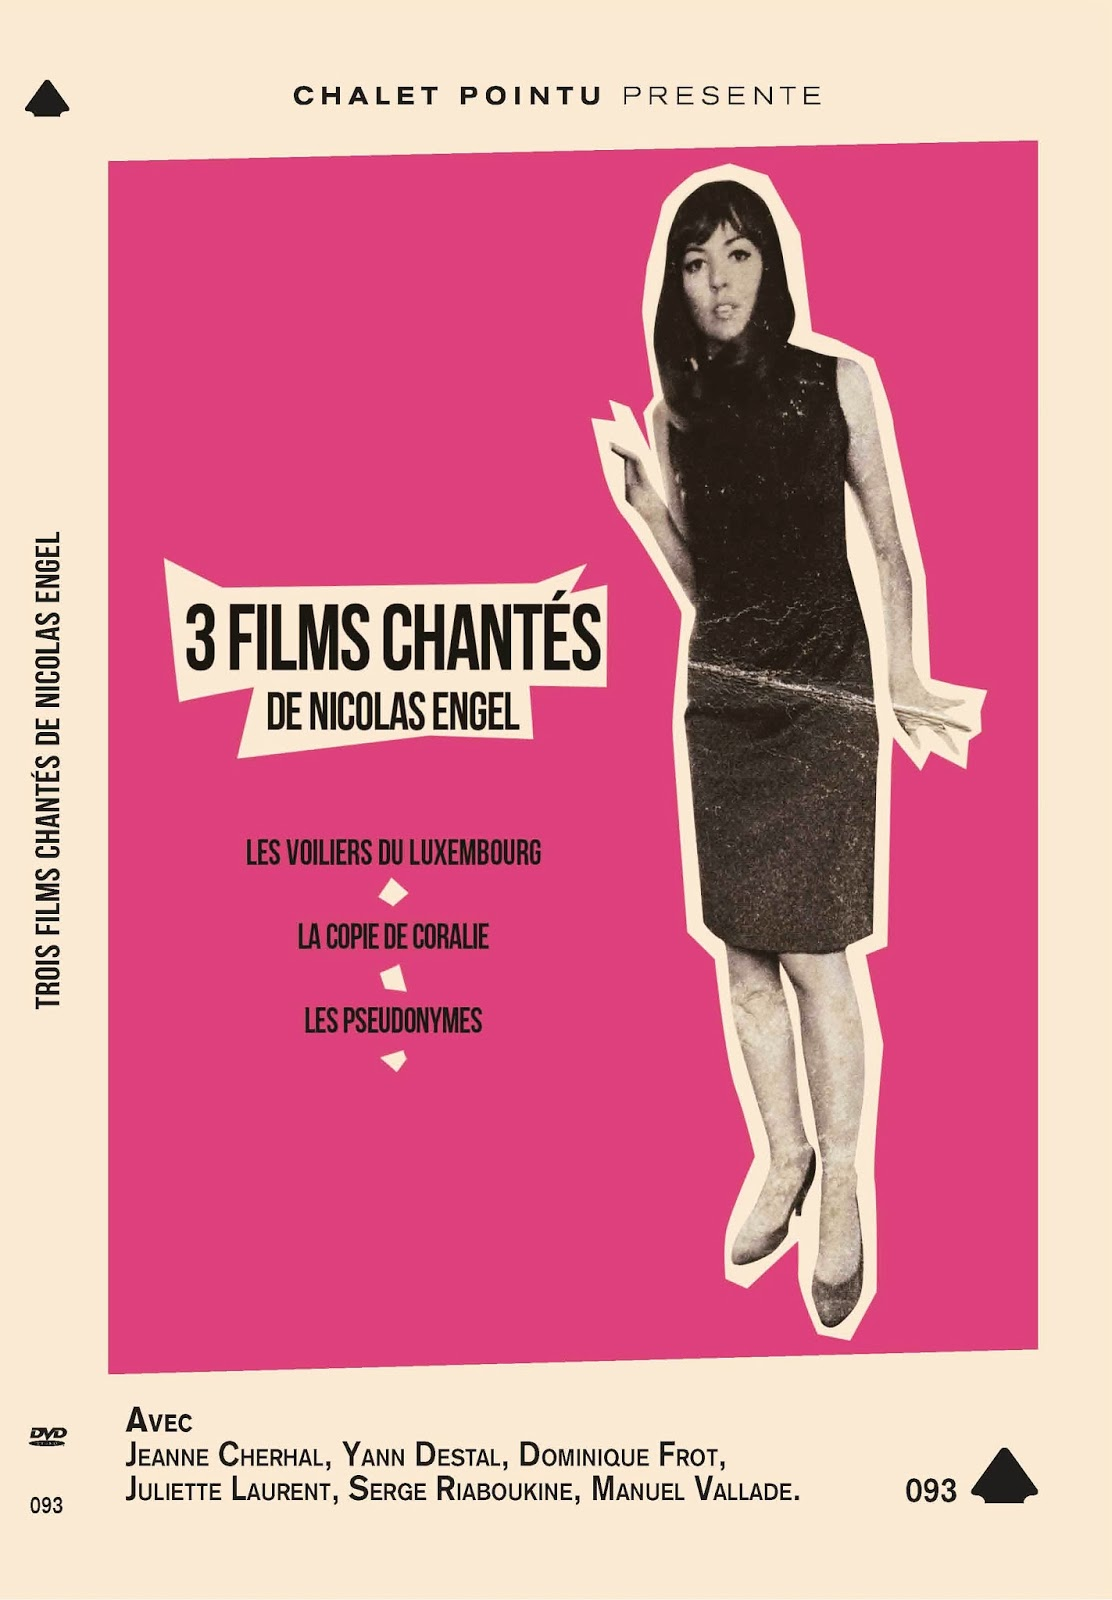 http://www.chazproductions.fr/2014/02/dvd-3-films-chantes-de-nicolas-engel.html